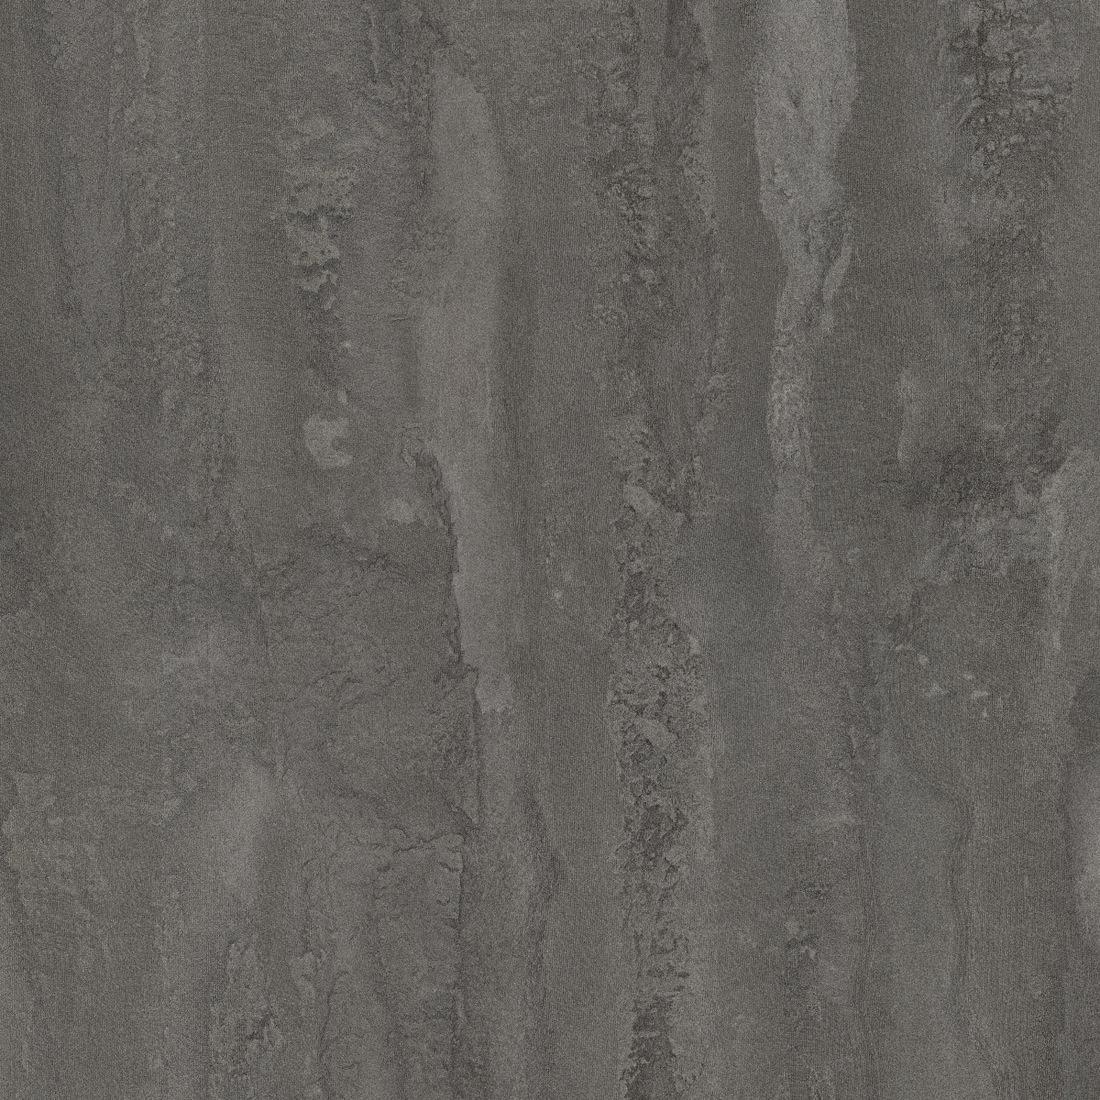 Pal melaminat Kronospan, Fier K352 RT, 2800 x 2070 x 18 mm